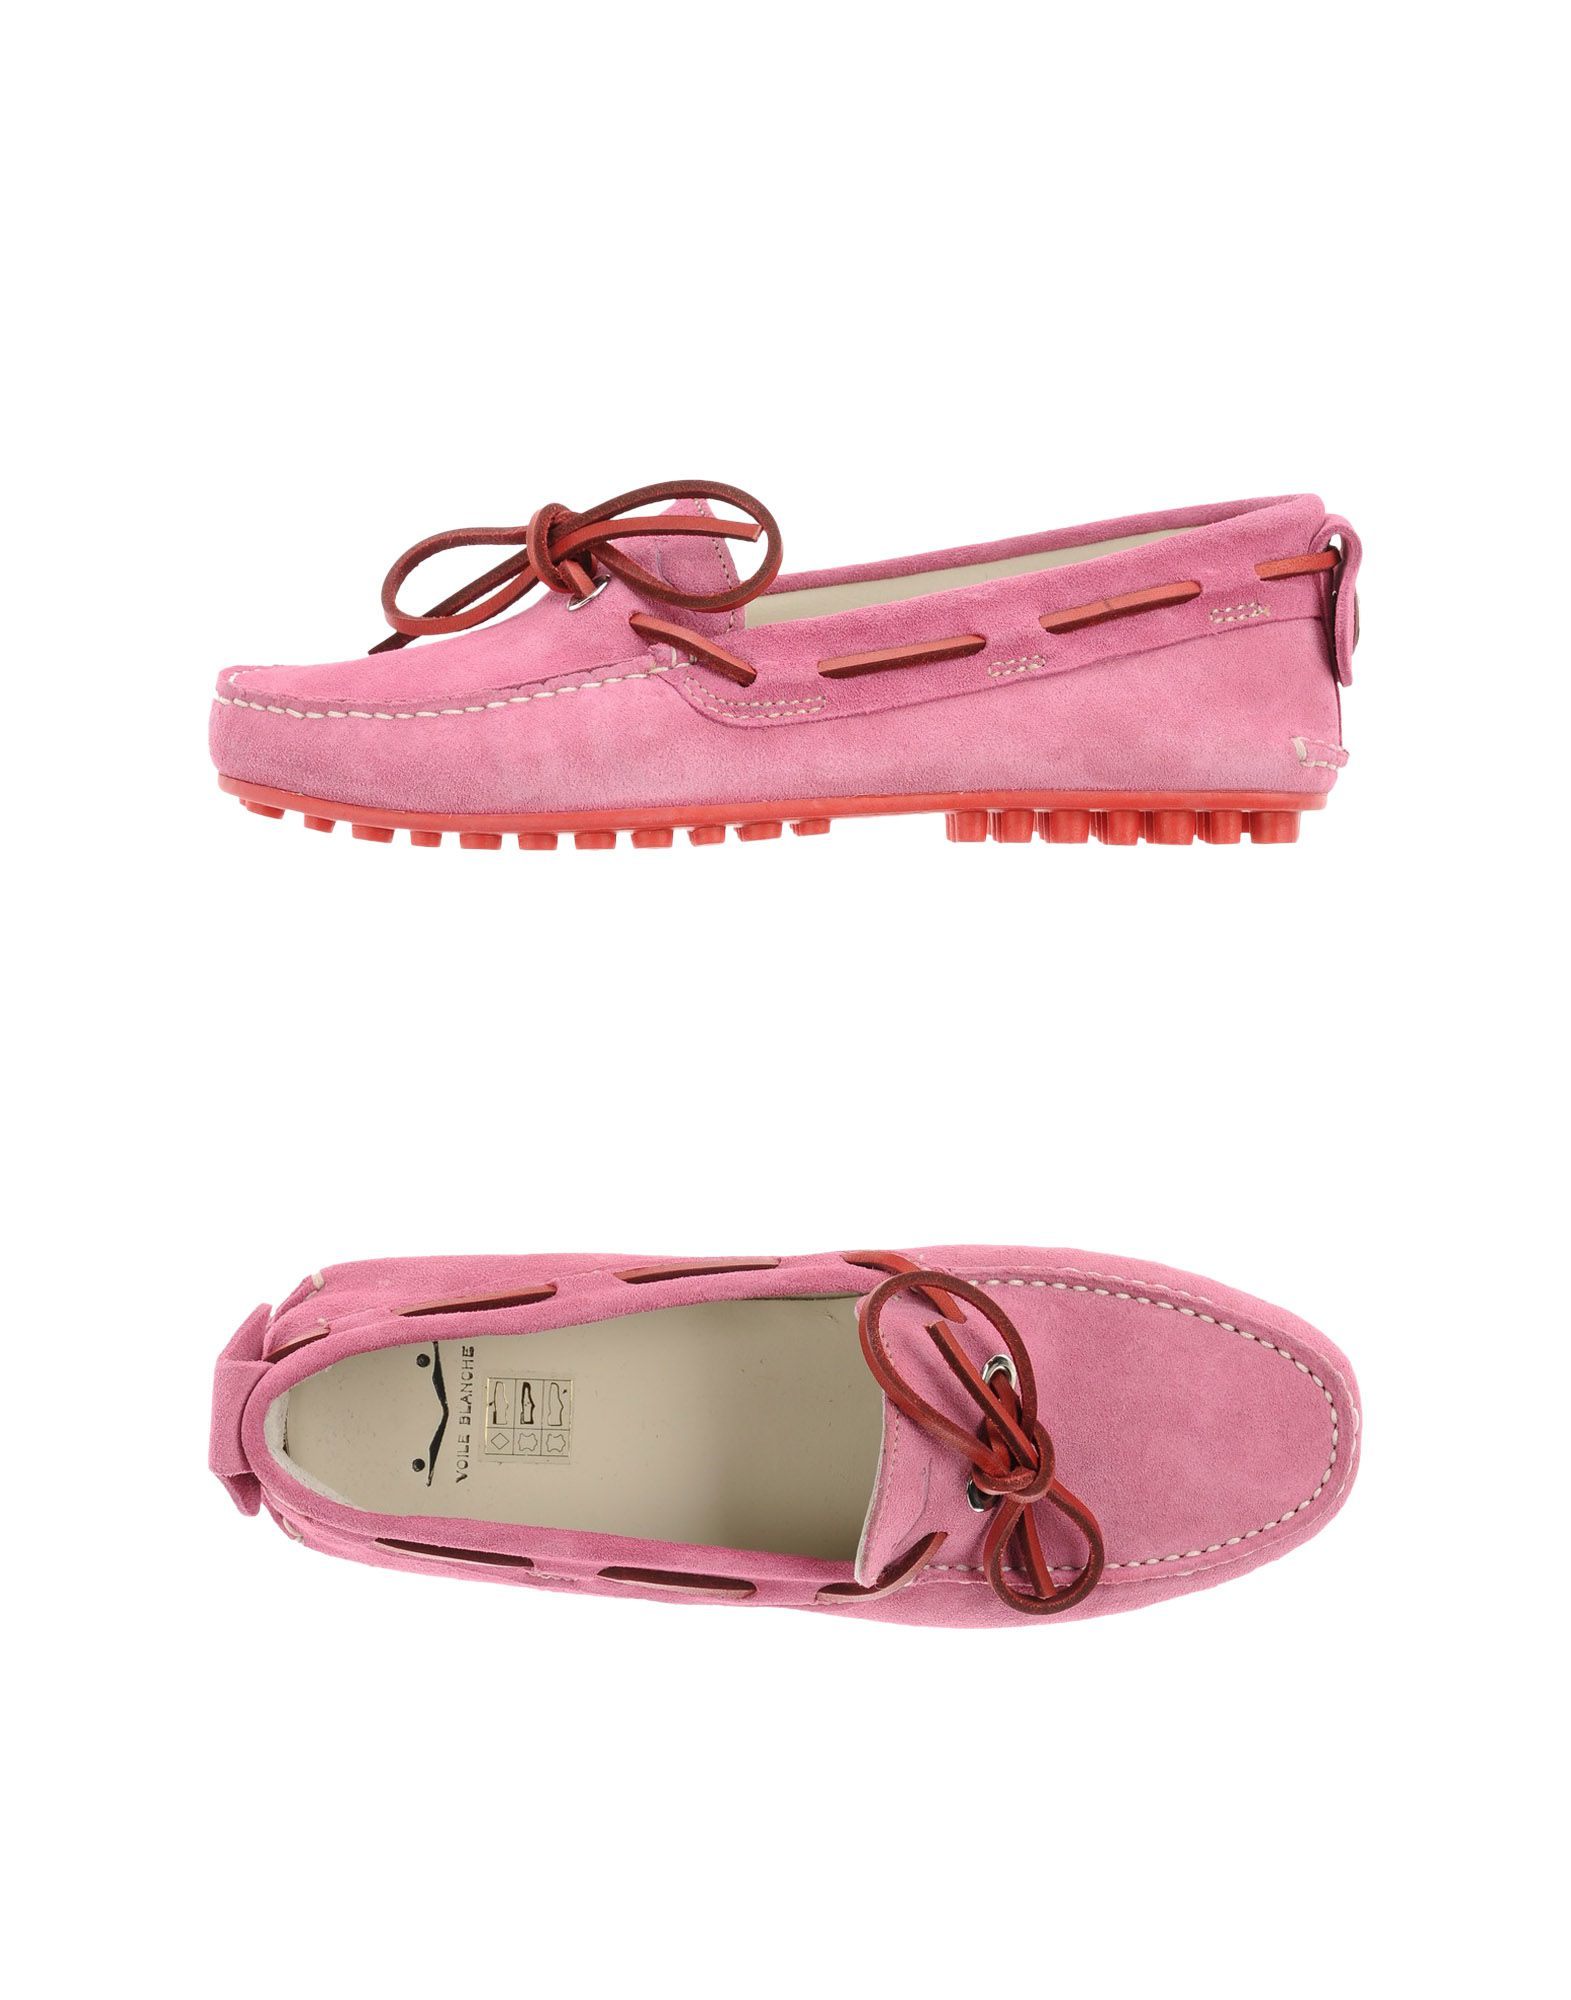 Voile Blanche Mens Shoes